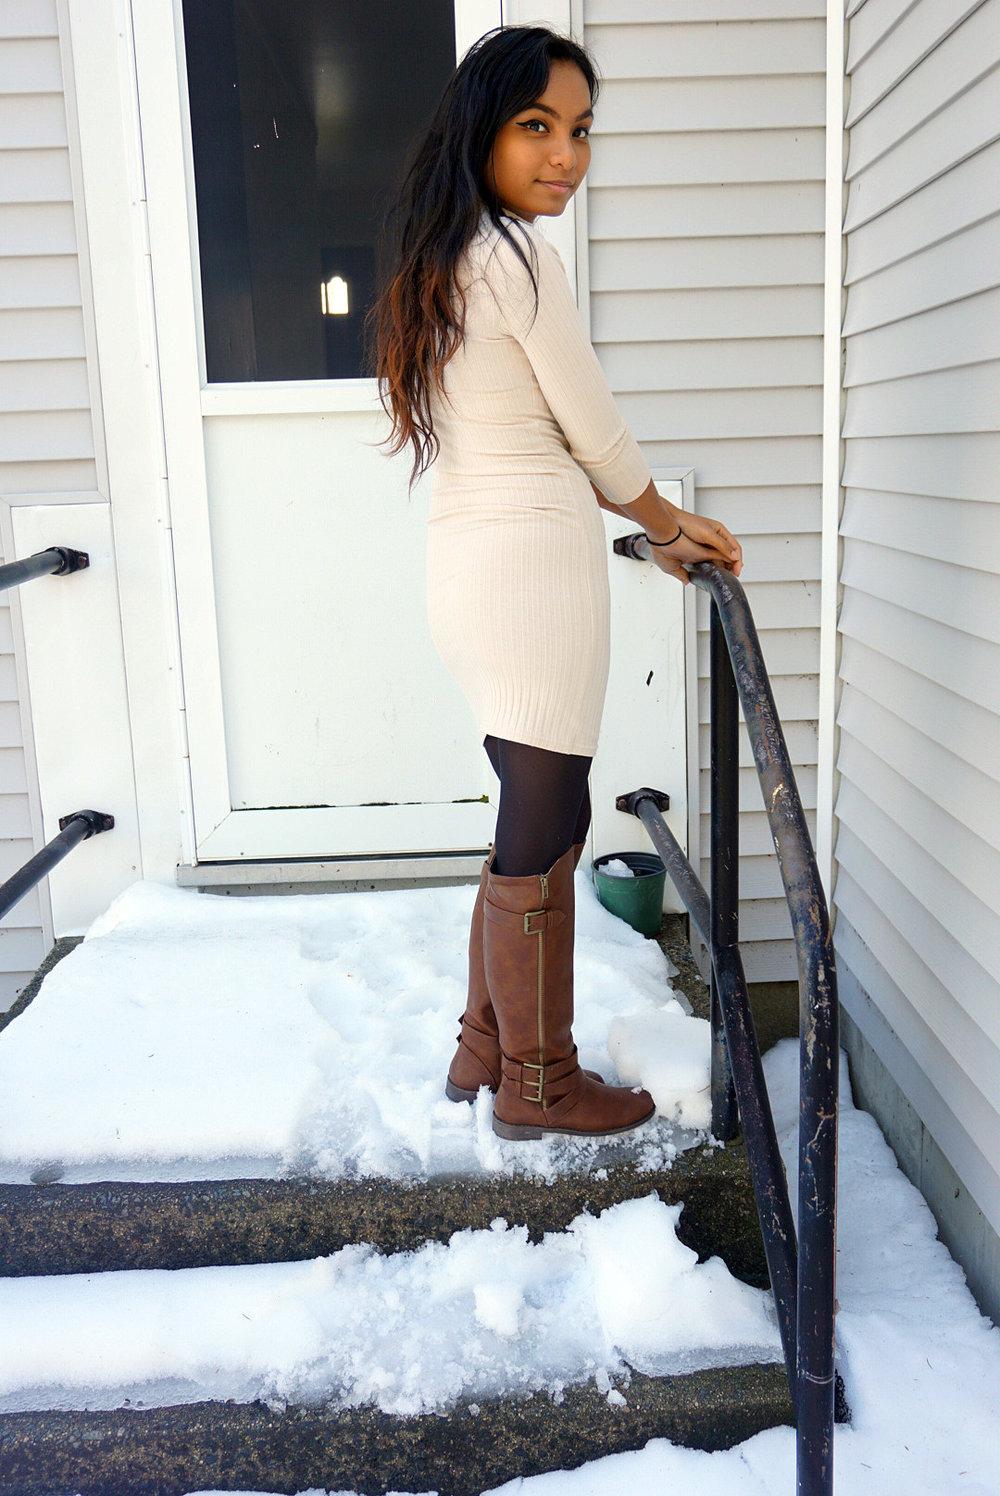 White-Dress-Caramel-Cardigan-Transitioning-To-Spring-Fashionista-Blogger-Style-LINDATENCHITRAN-5-1080x1616.jpg